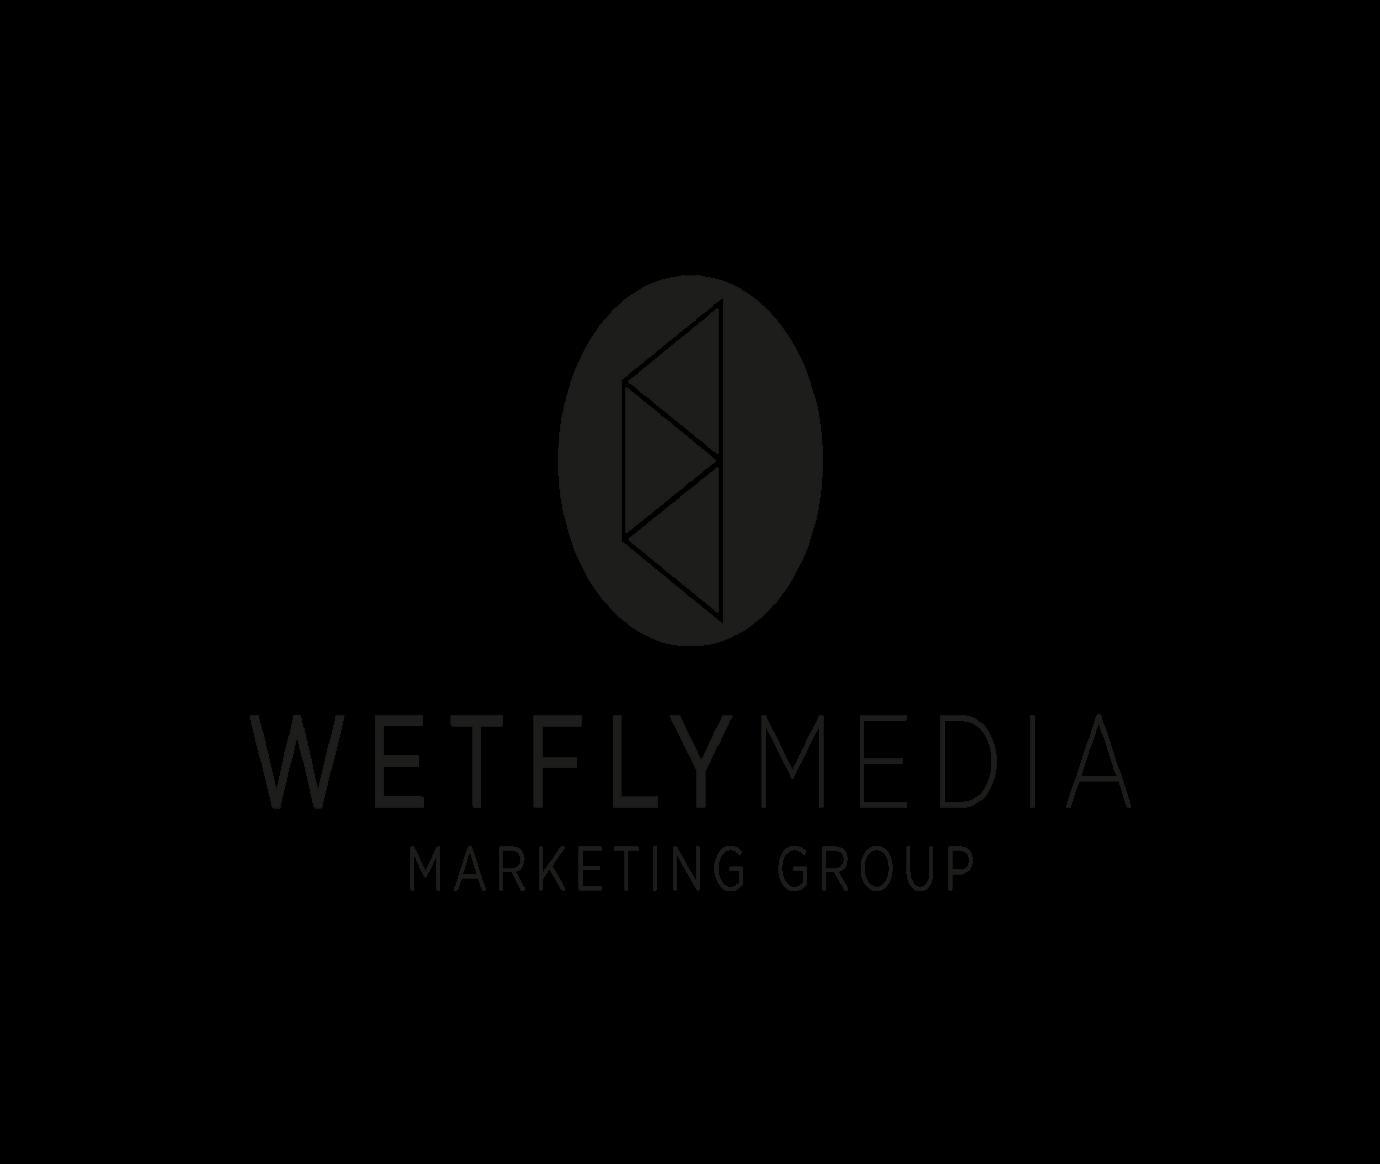 wetfly-media-negro.png